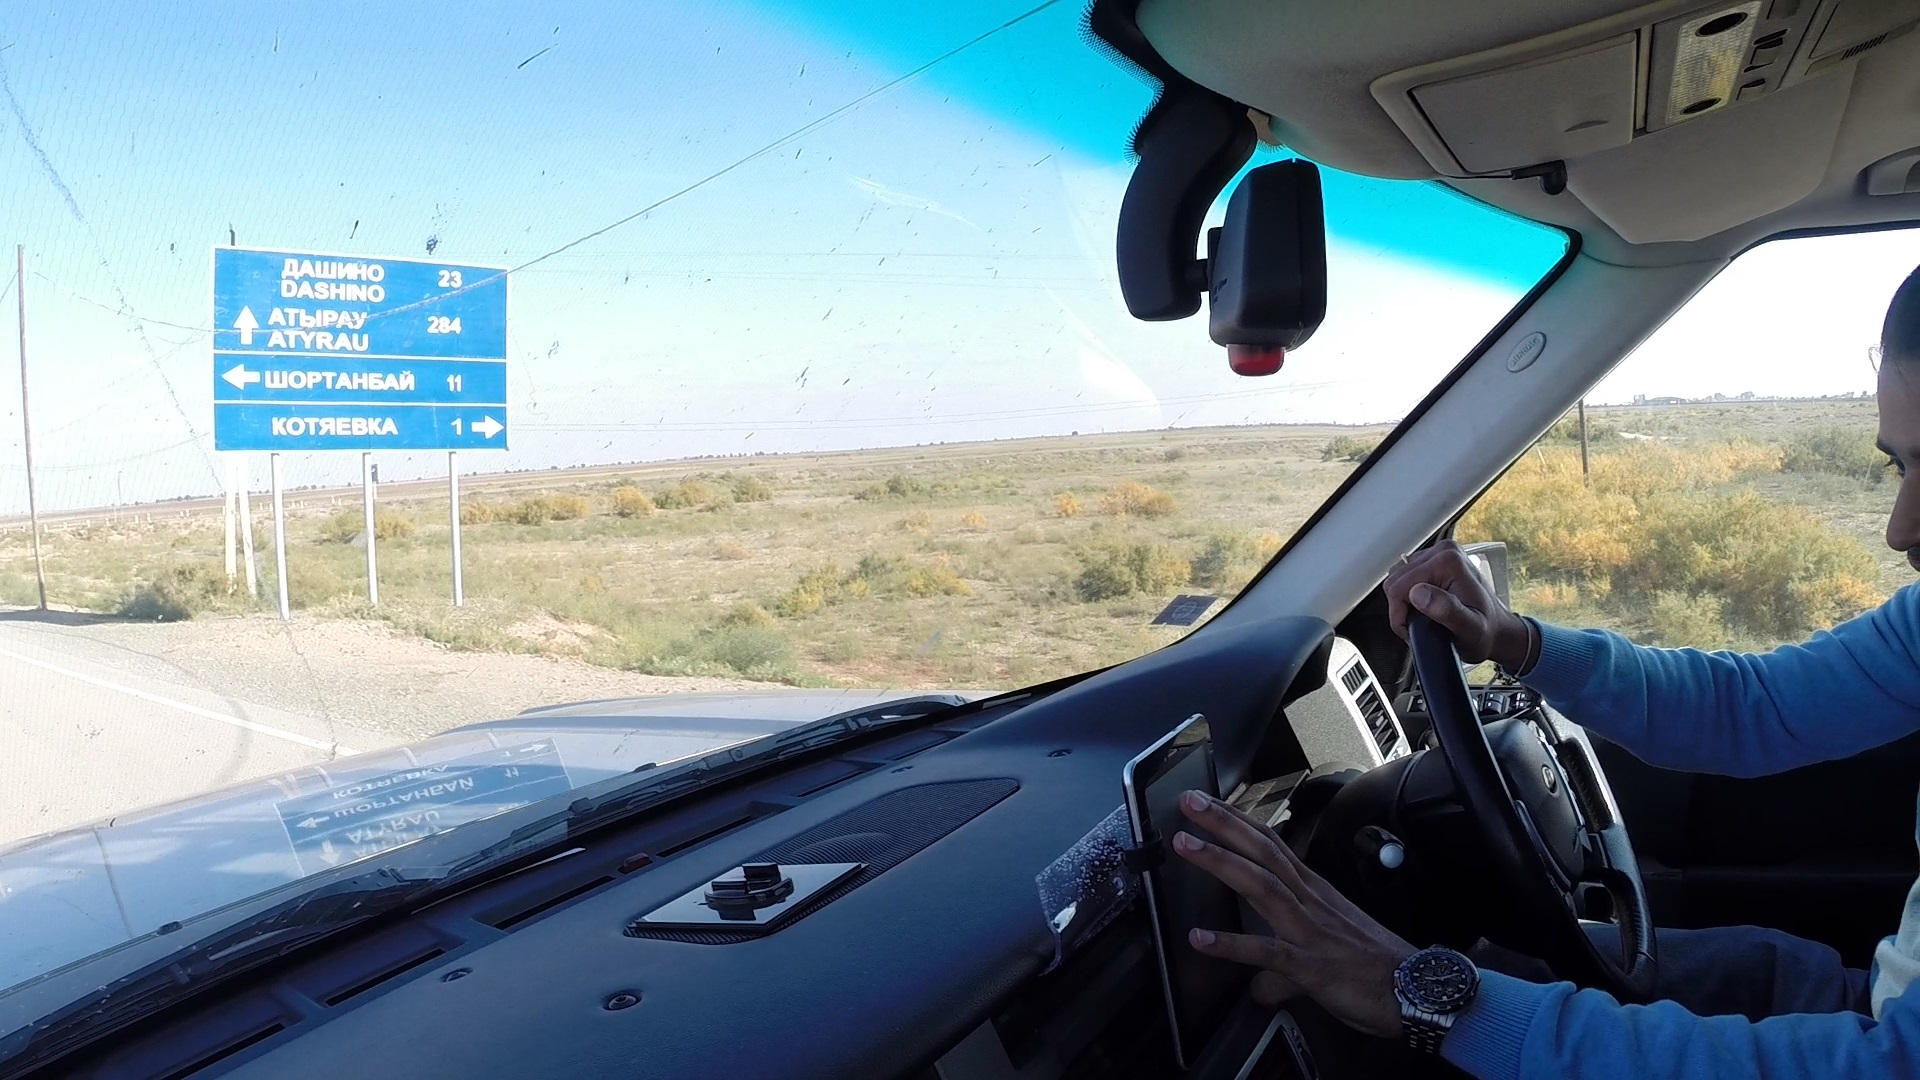 Entered Kazakhstan